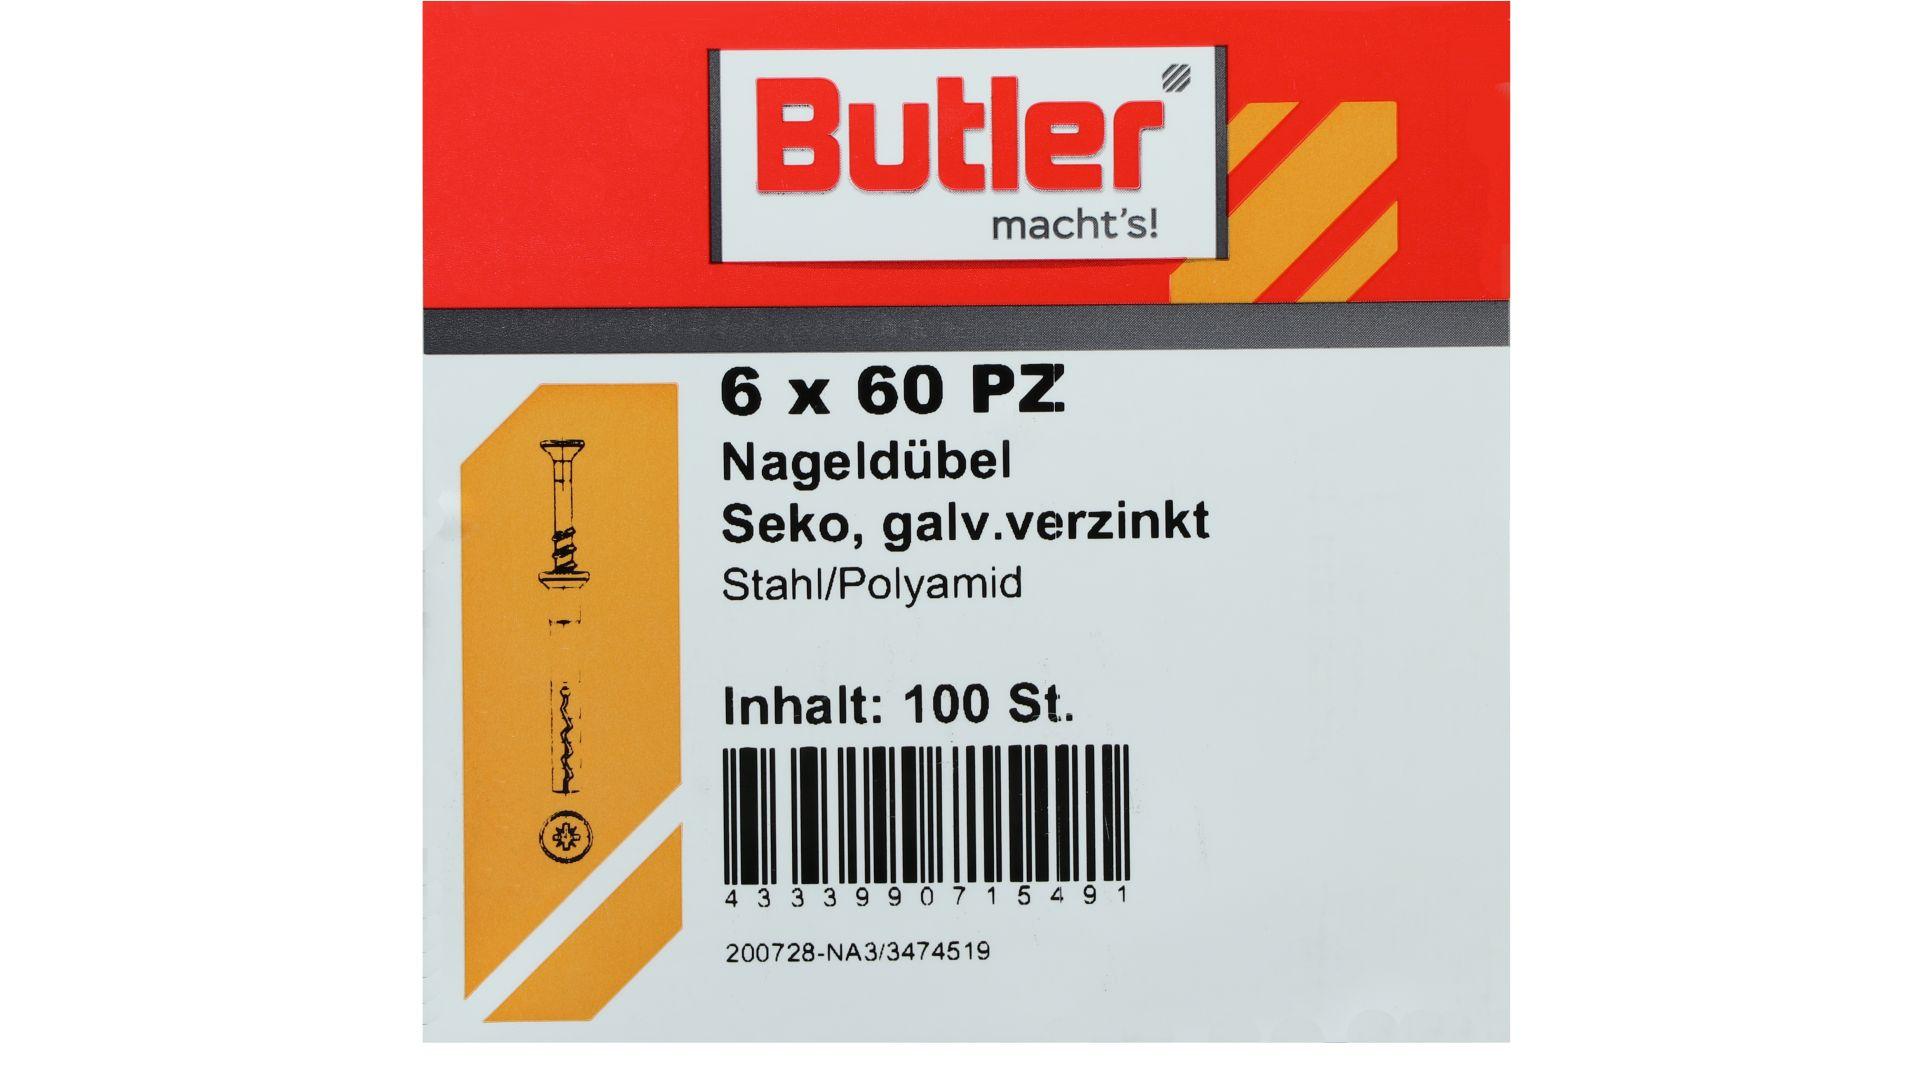 Butler macht's! Nageldübel, Stahl / Polyamid, Senkkopf, galvanisch verzinkt 6 x 60 mm, 100 Stück